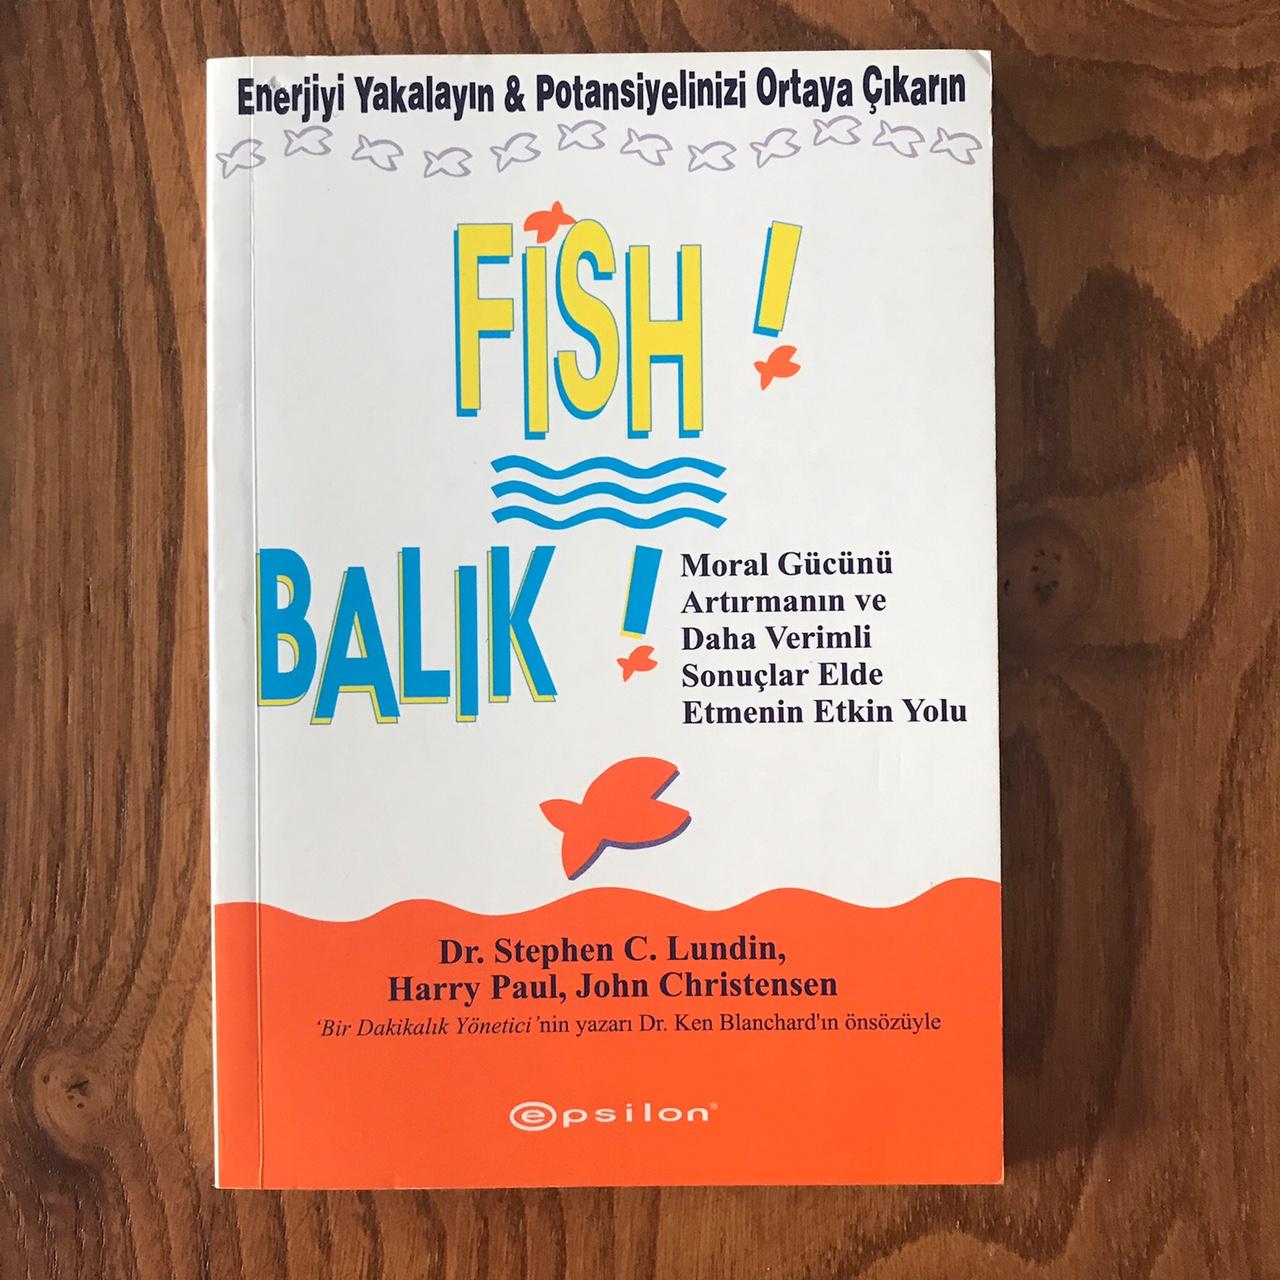 Fish! Balik! - Enerjiyi Yakalayin & Potansiyelinizi Ortaya Cikarin